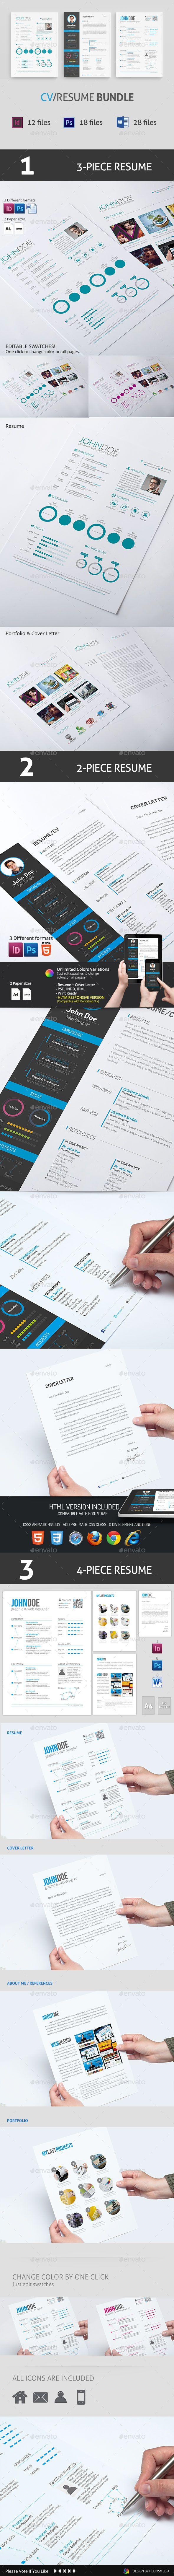 50 best cv resume images on pinterest creative resume design